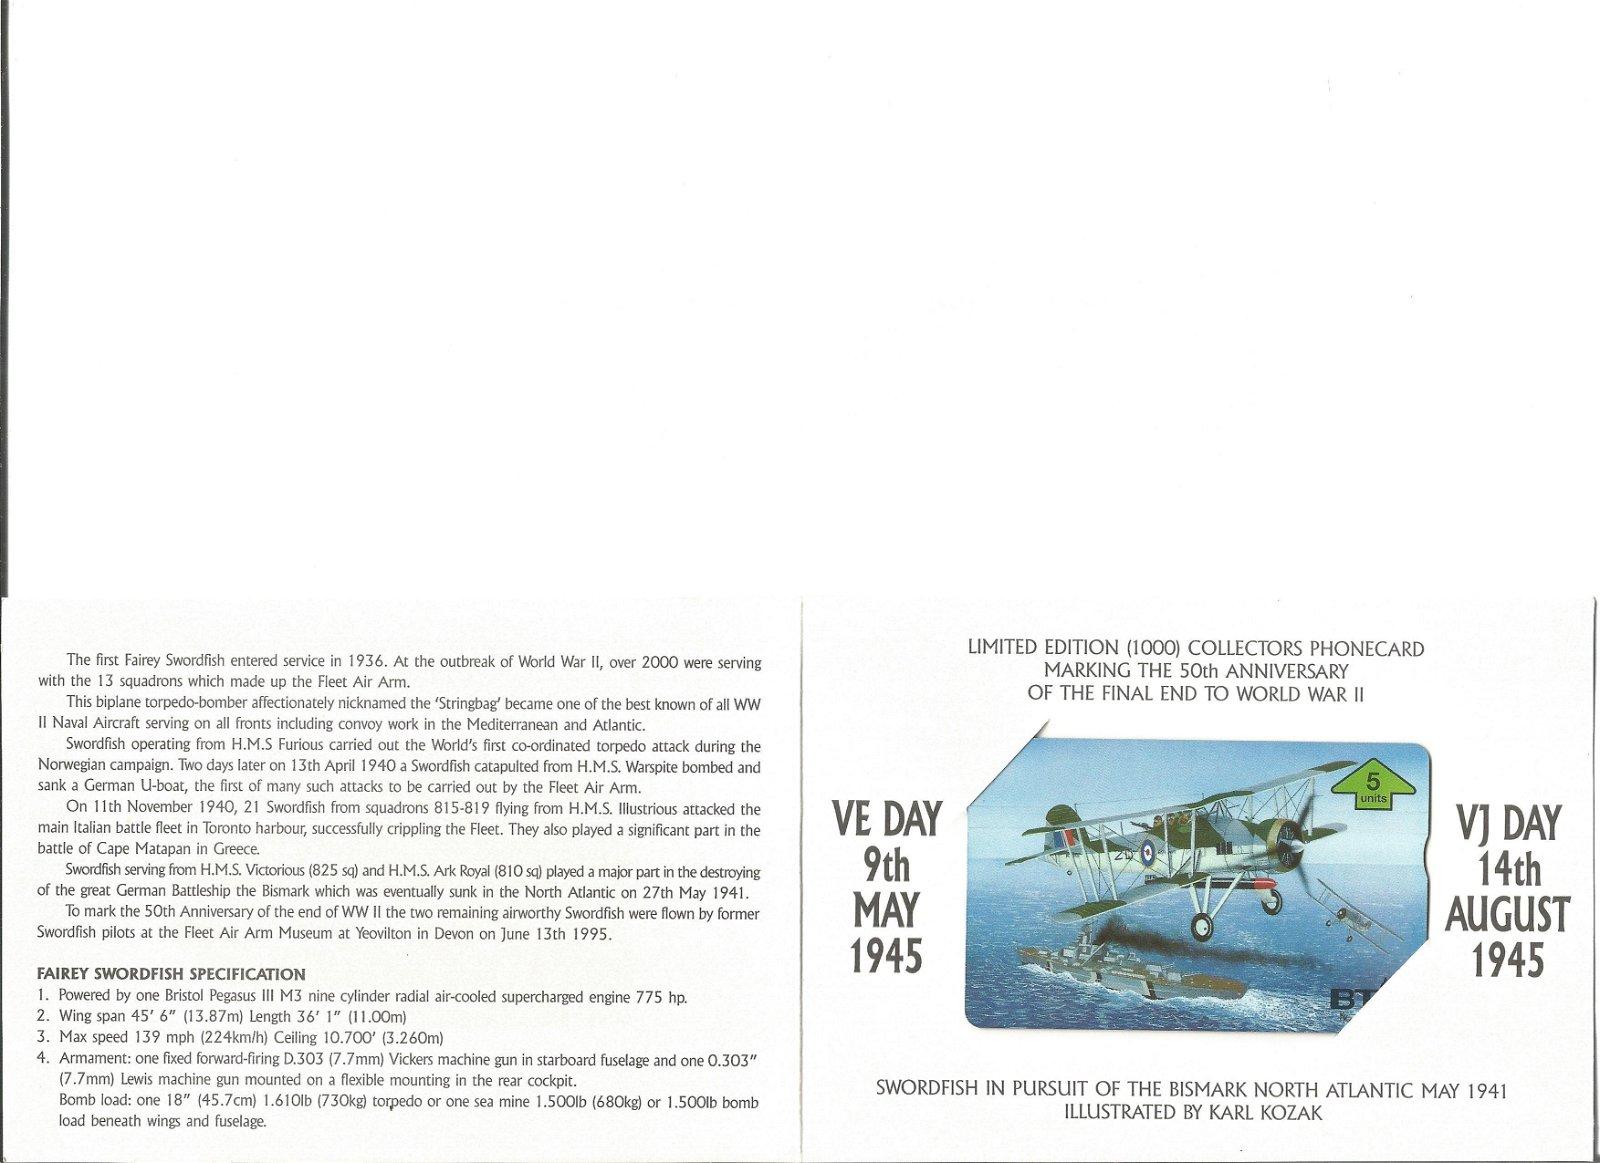 Fairey Swordfish Mk1 50th anniv of the final end to